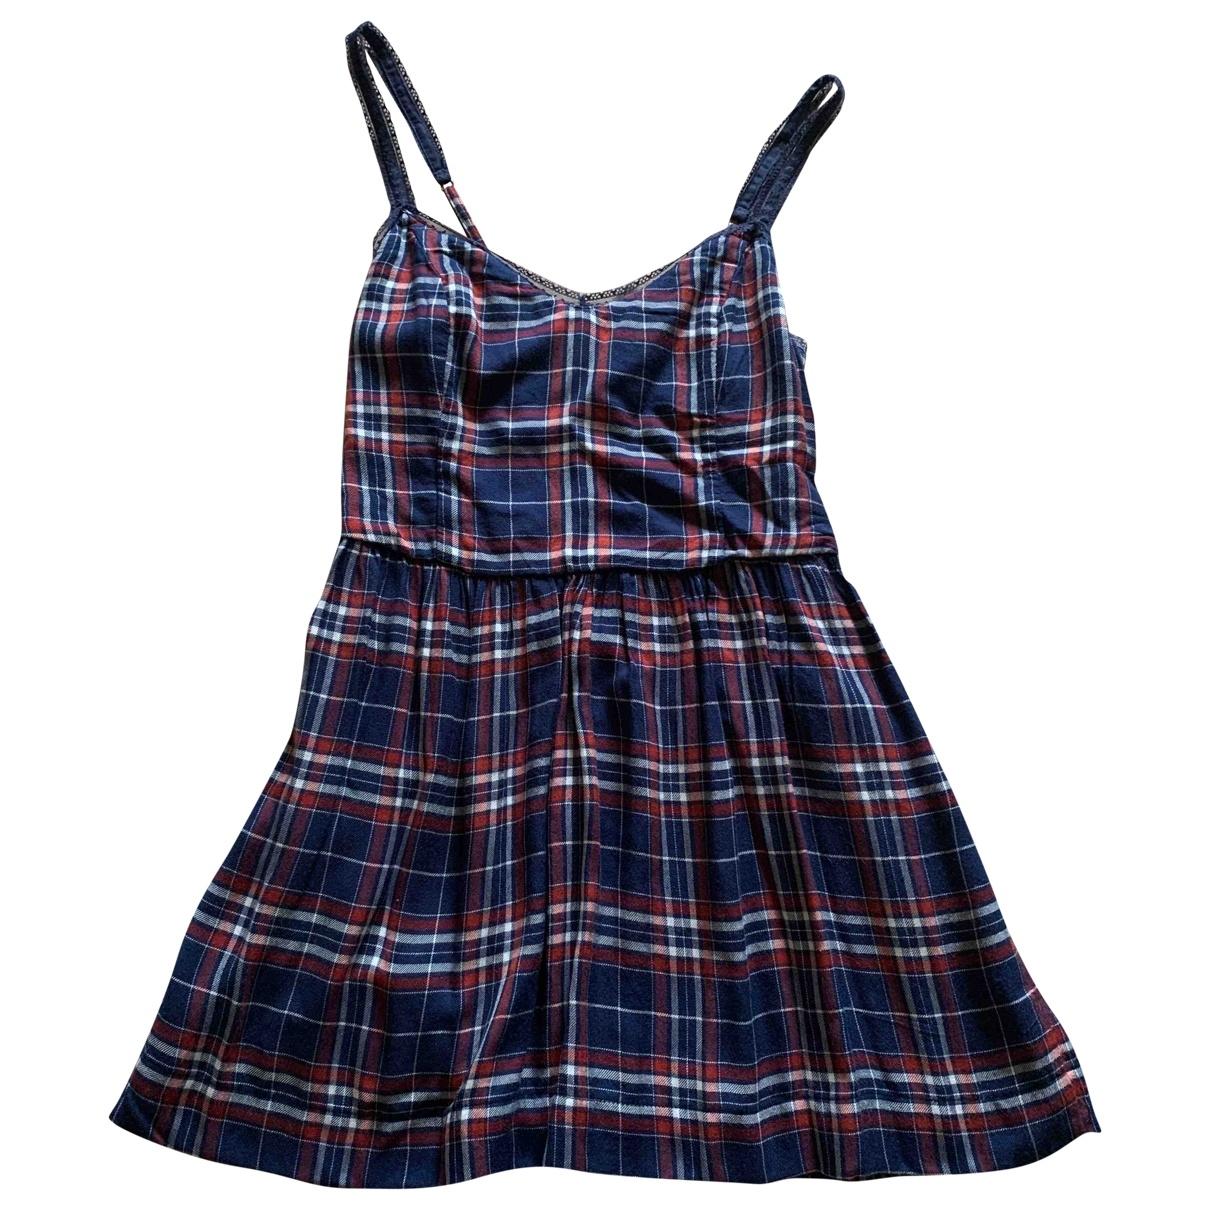 Abercrombie & Fitch \N Blue Cotton dress for Women M International